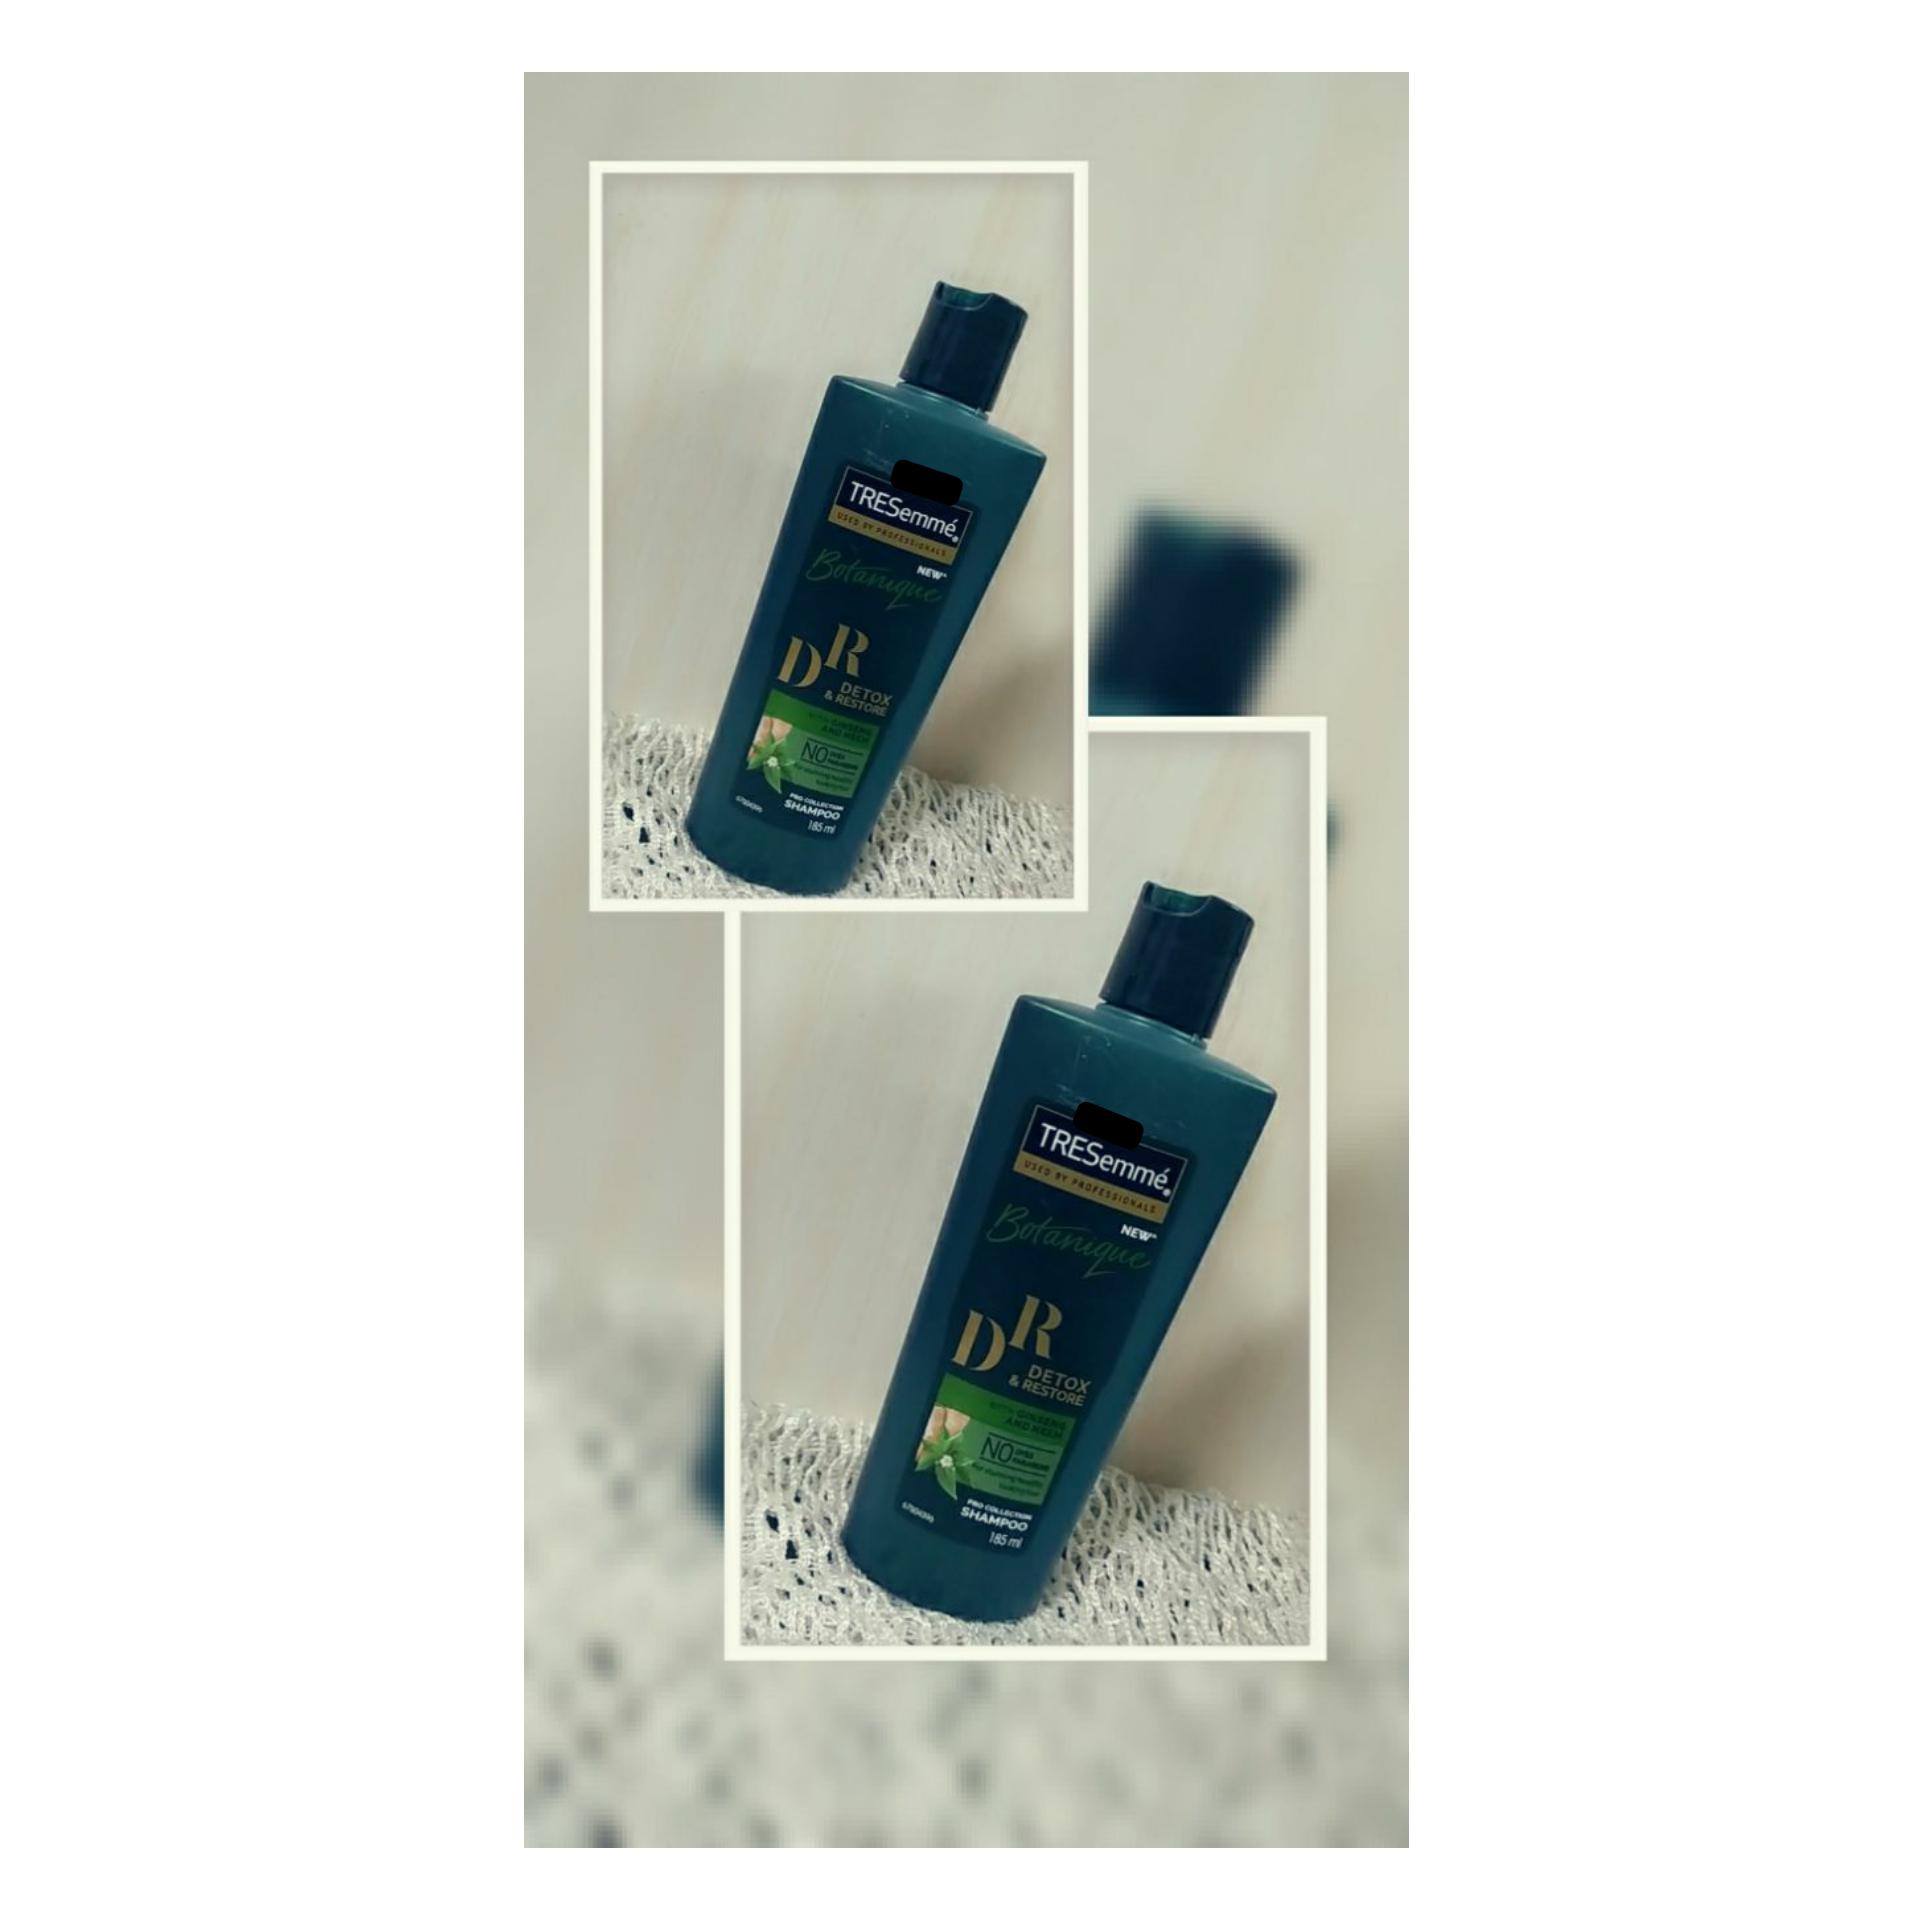 Tresemme Botanique Detox & Restore Shampoo-Clean hair-By taniyajoshi13